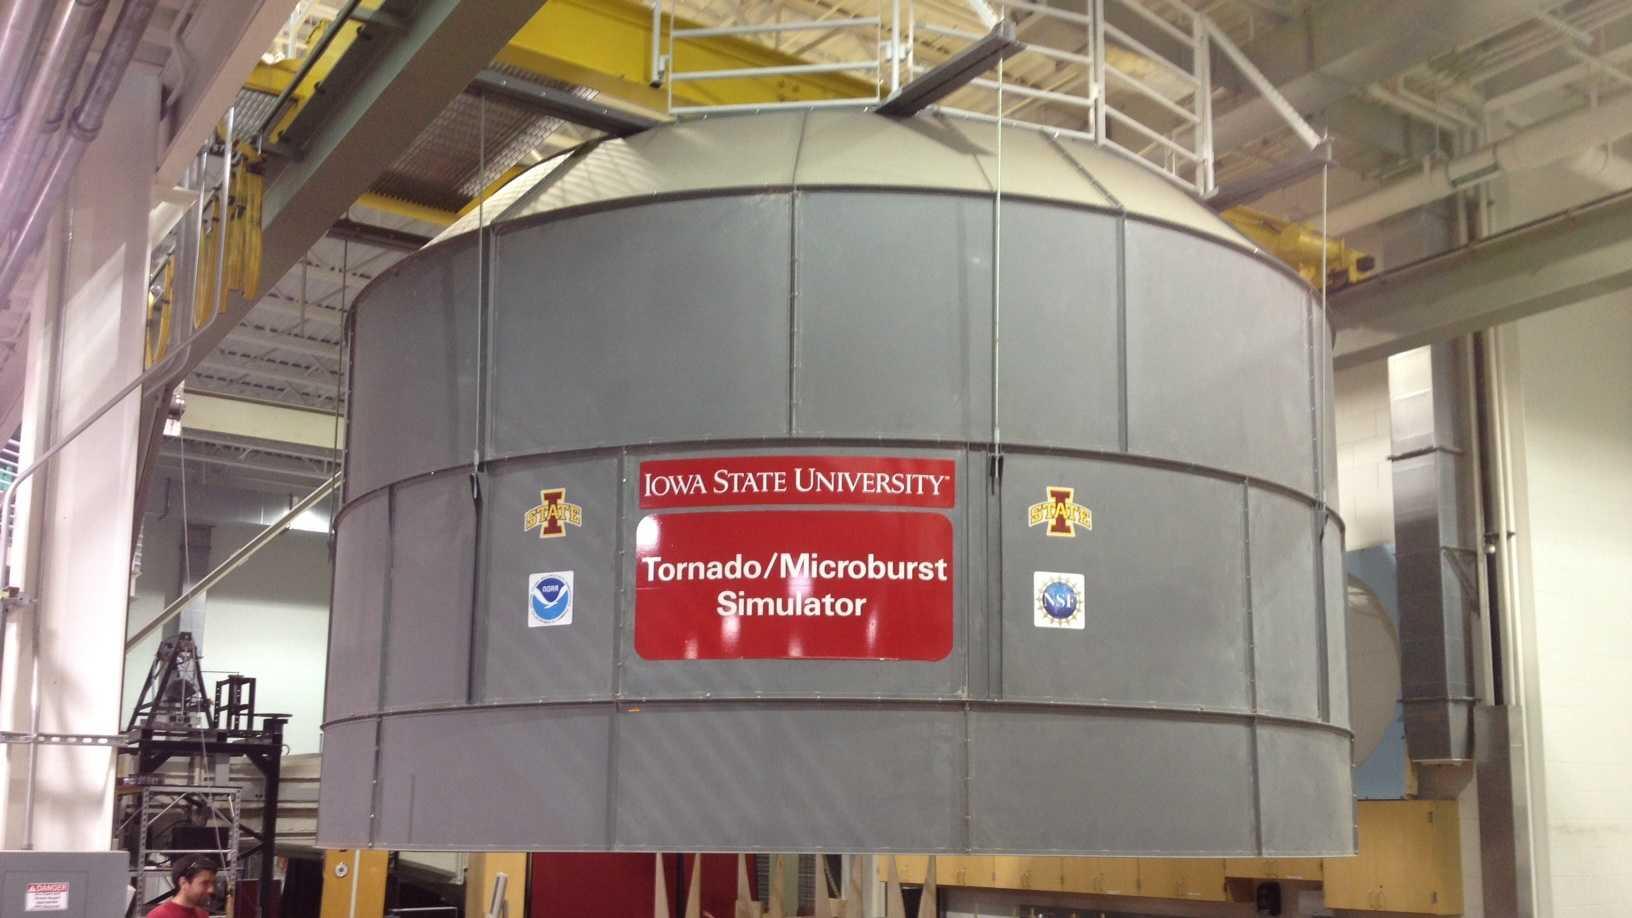 Iowa State University Tornado Simulator